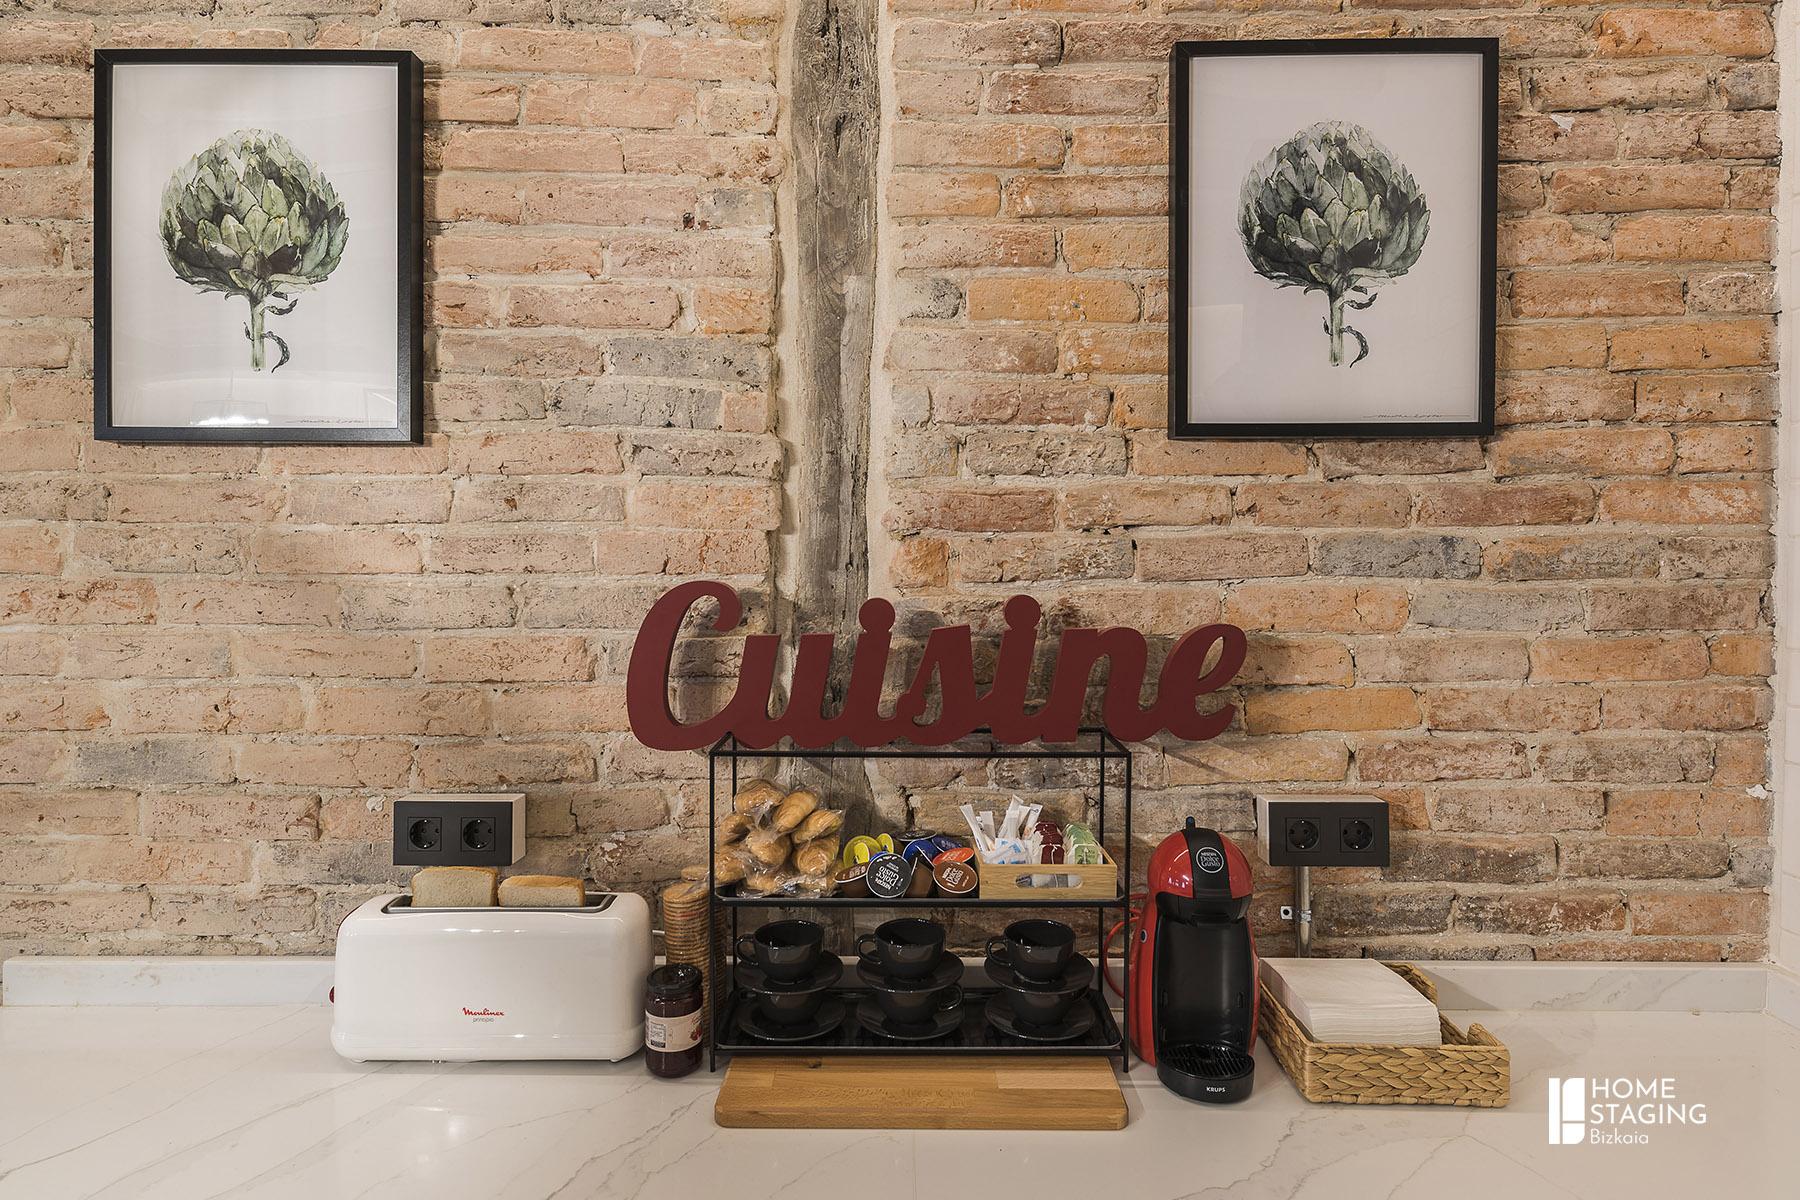 airbnb-bilbao-bizkaia-spain-pais vasco